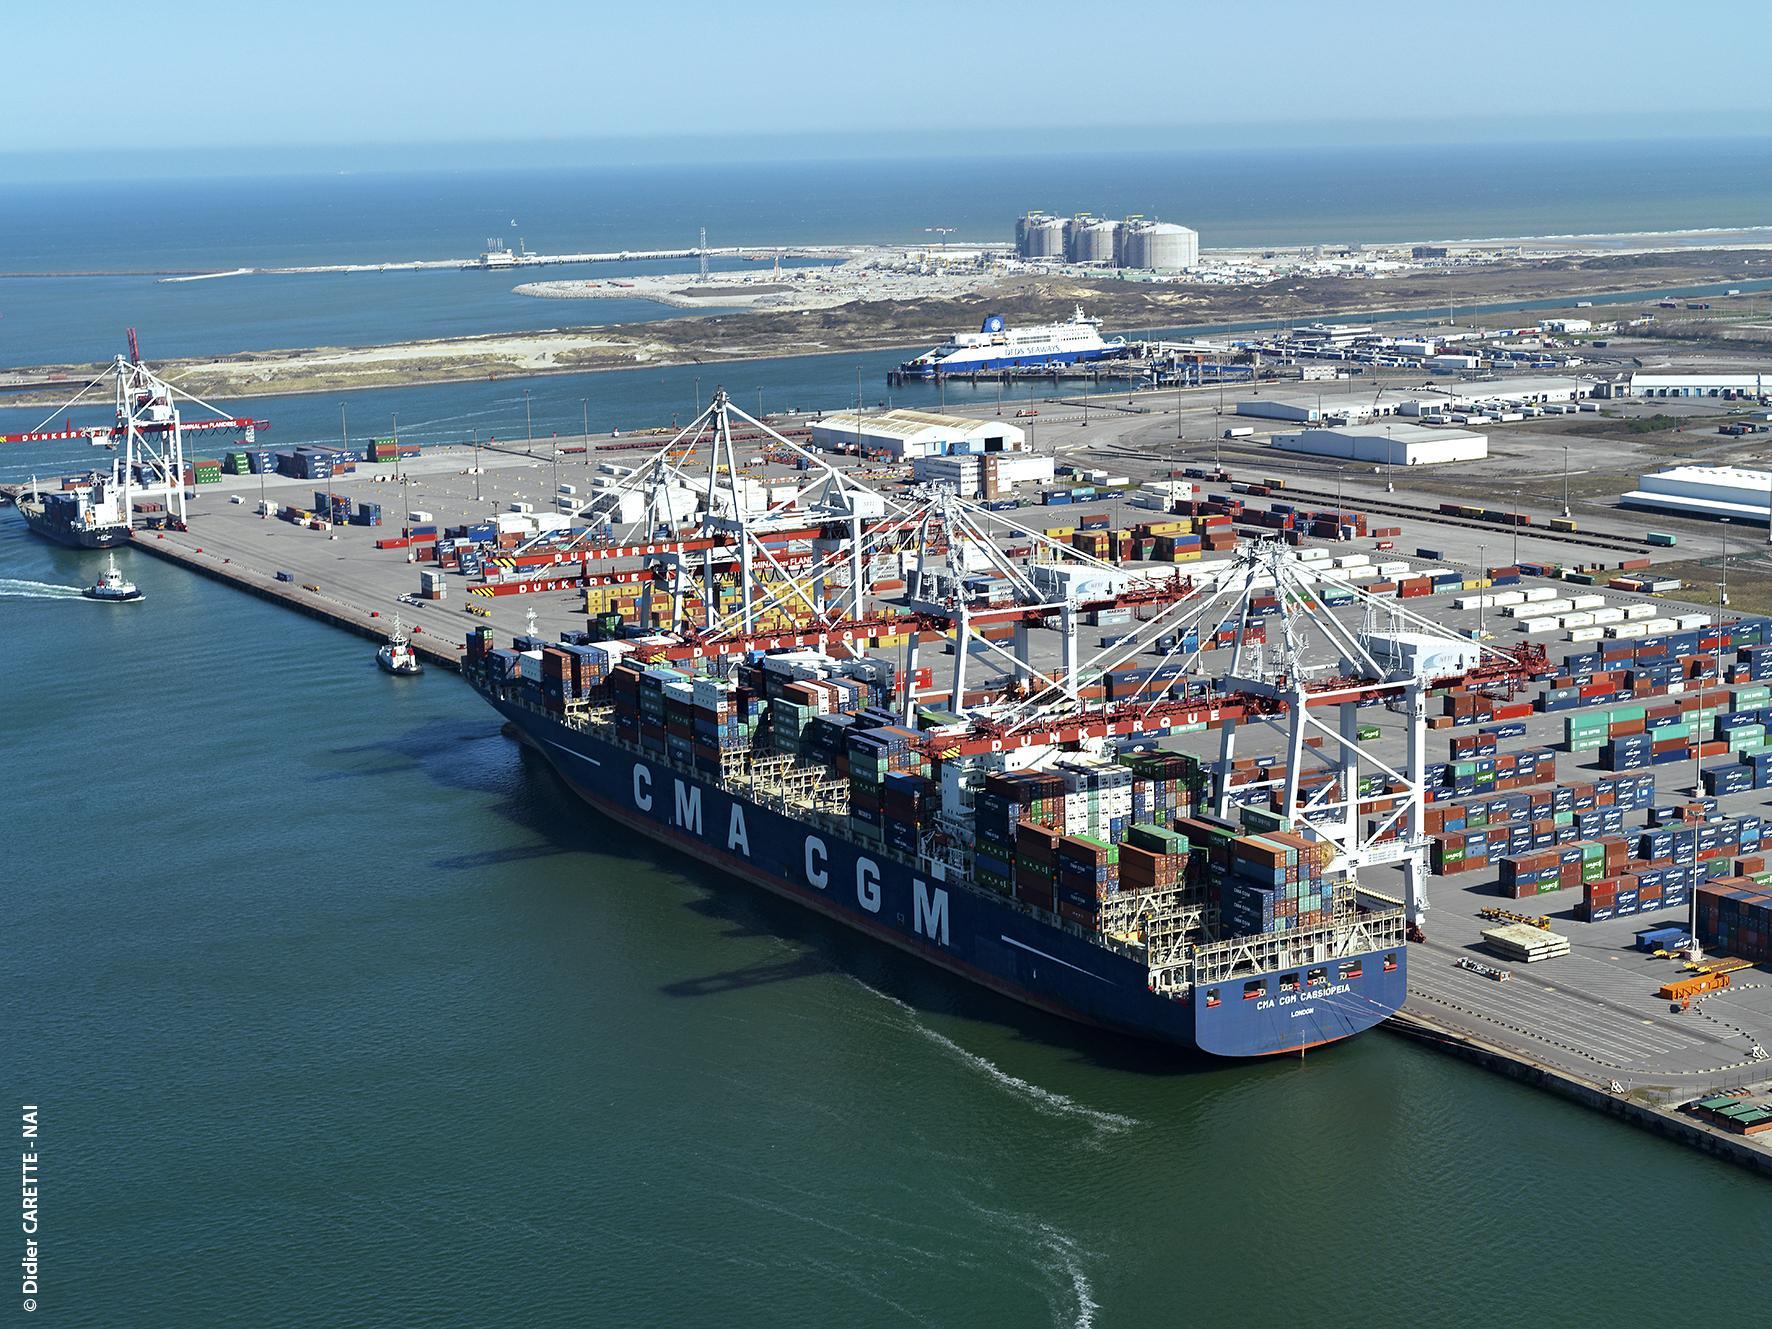 Grand port maritime de dunkerque port de france - Chambre des commerces dunkerque ...